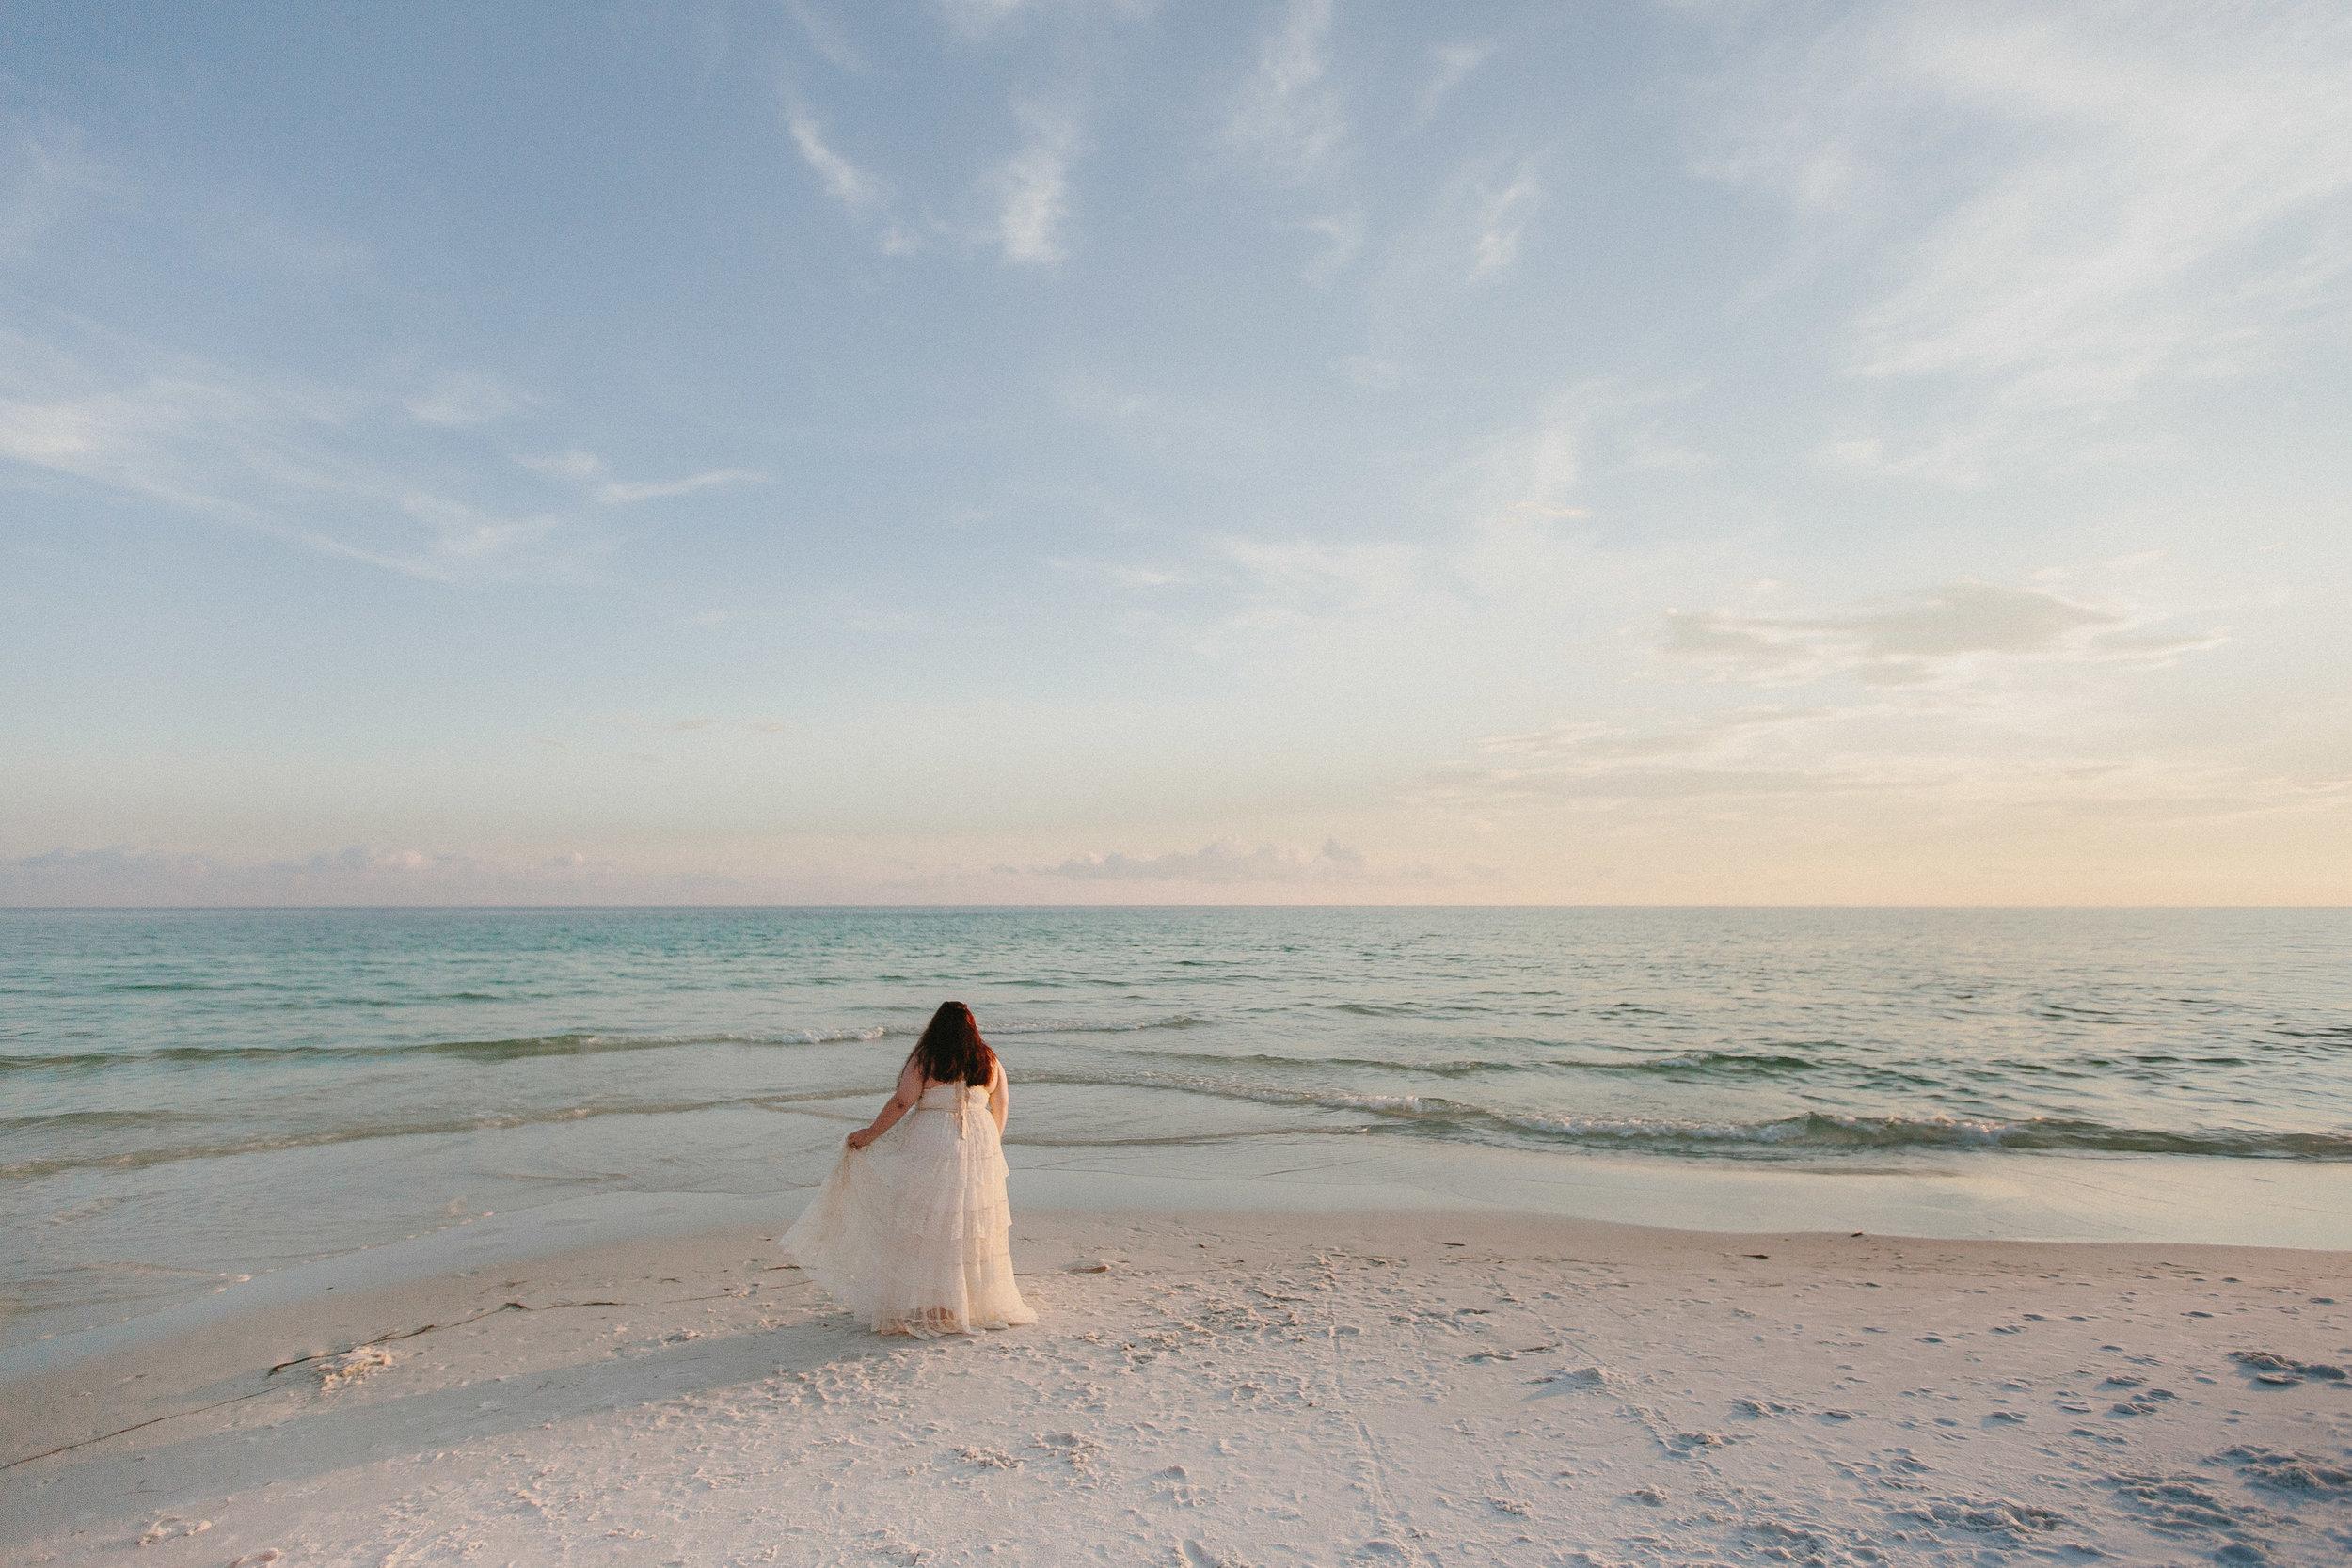 destin_sunset_beach_elopement_intimate_wedding_photographer_florida_documentary_1259.jpg